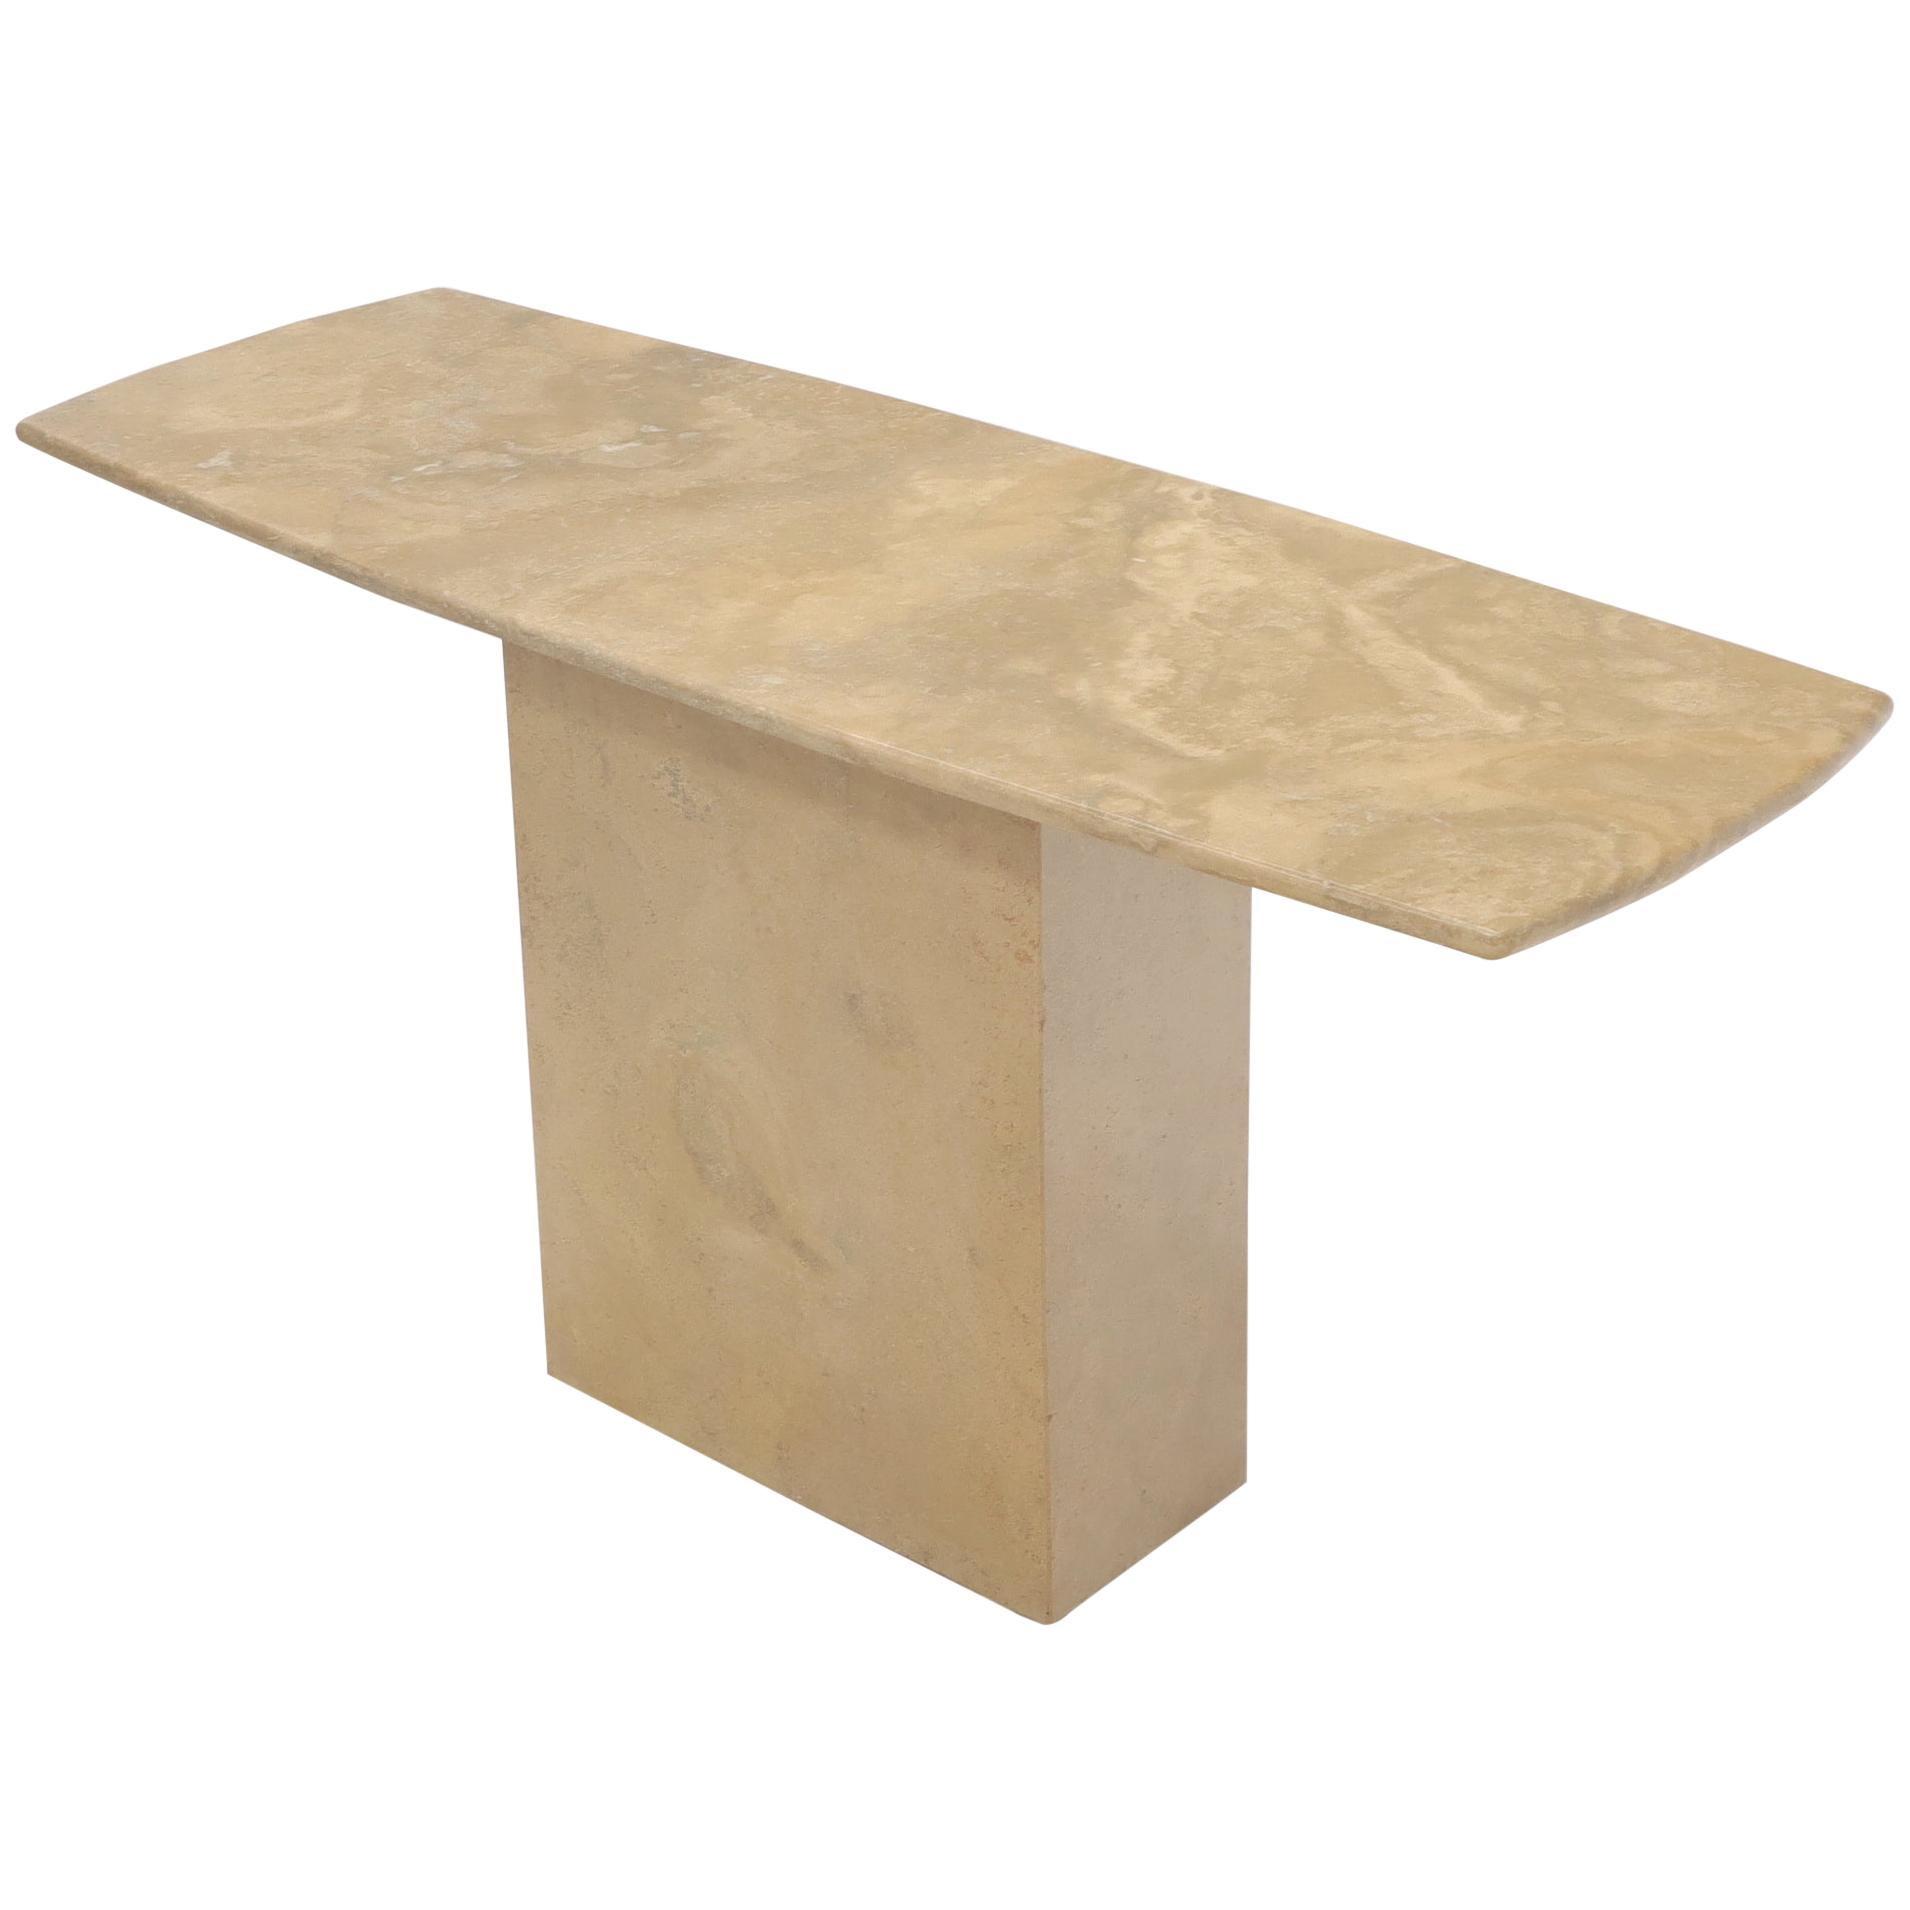 Mid-Century Modern Marble or Travertine Single Pedestal Console